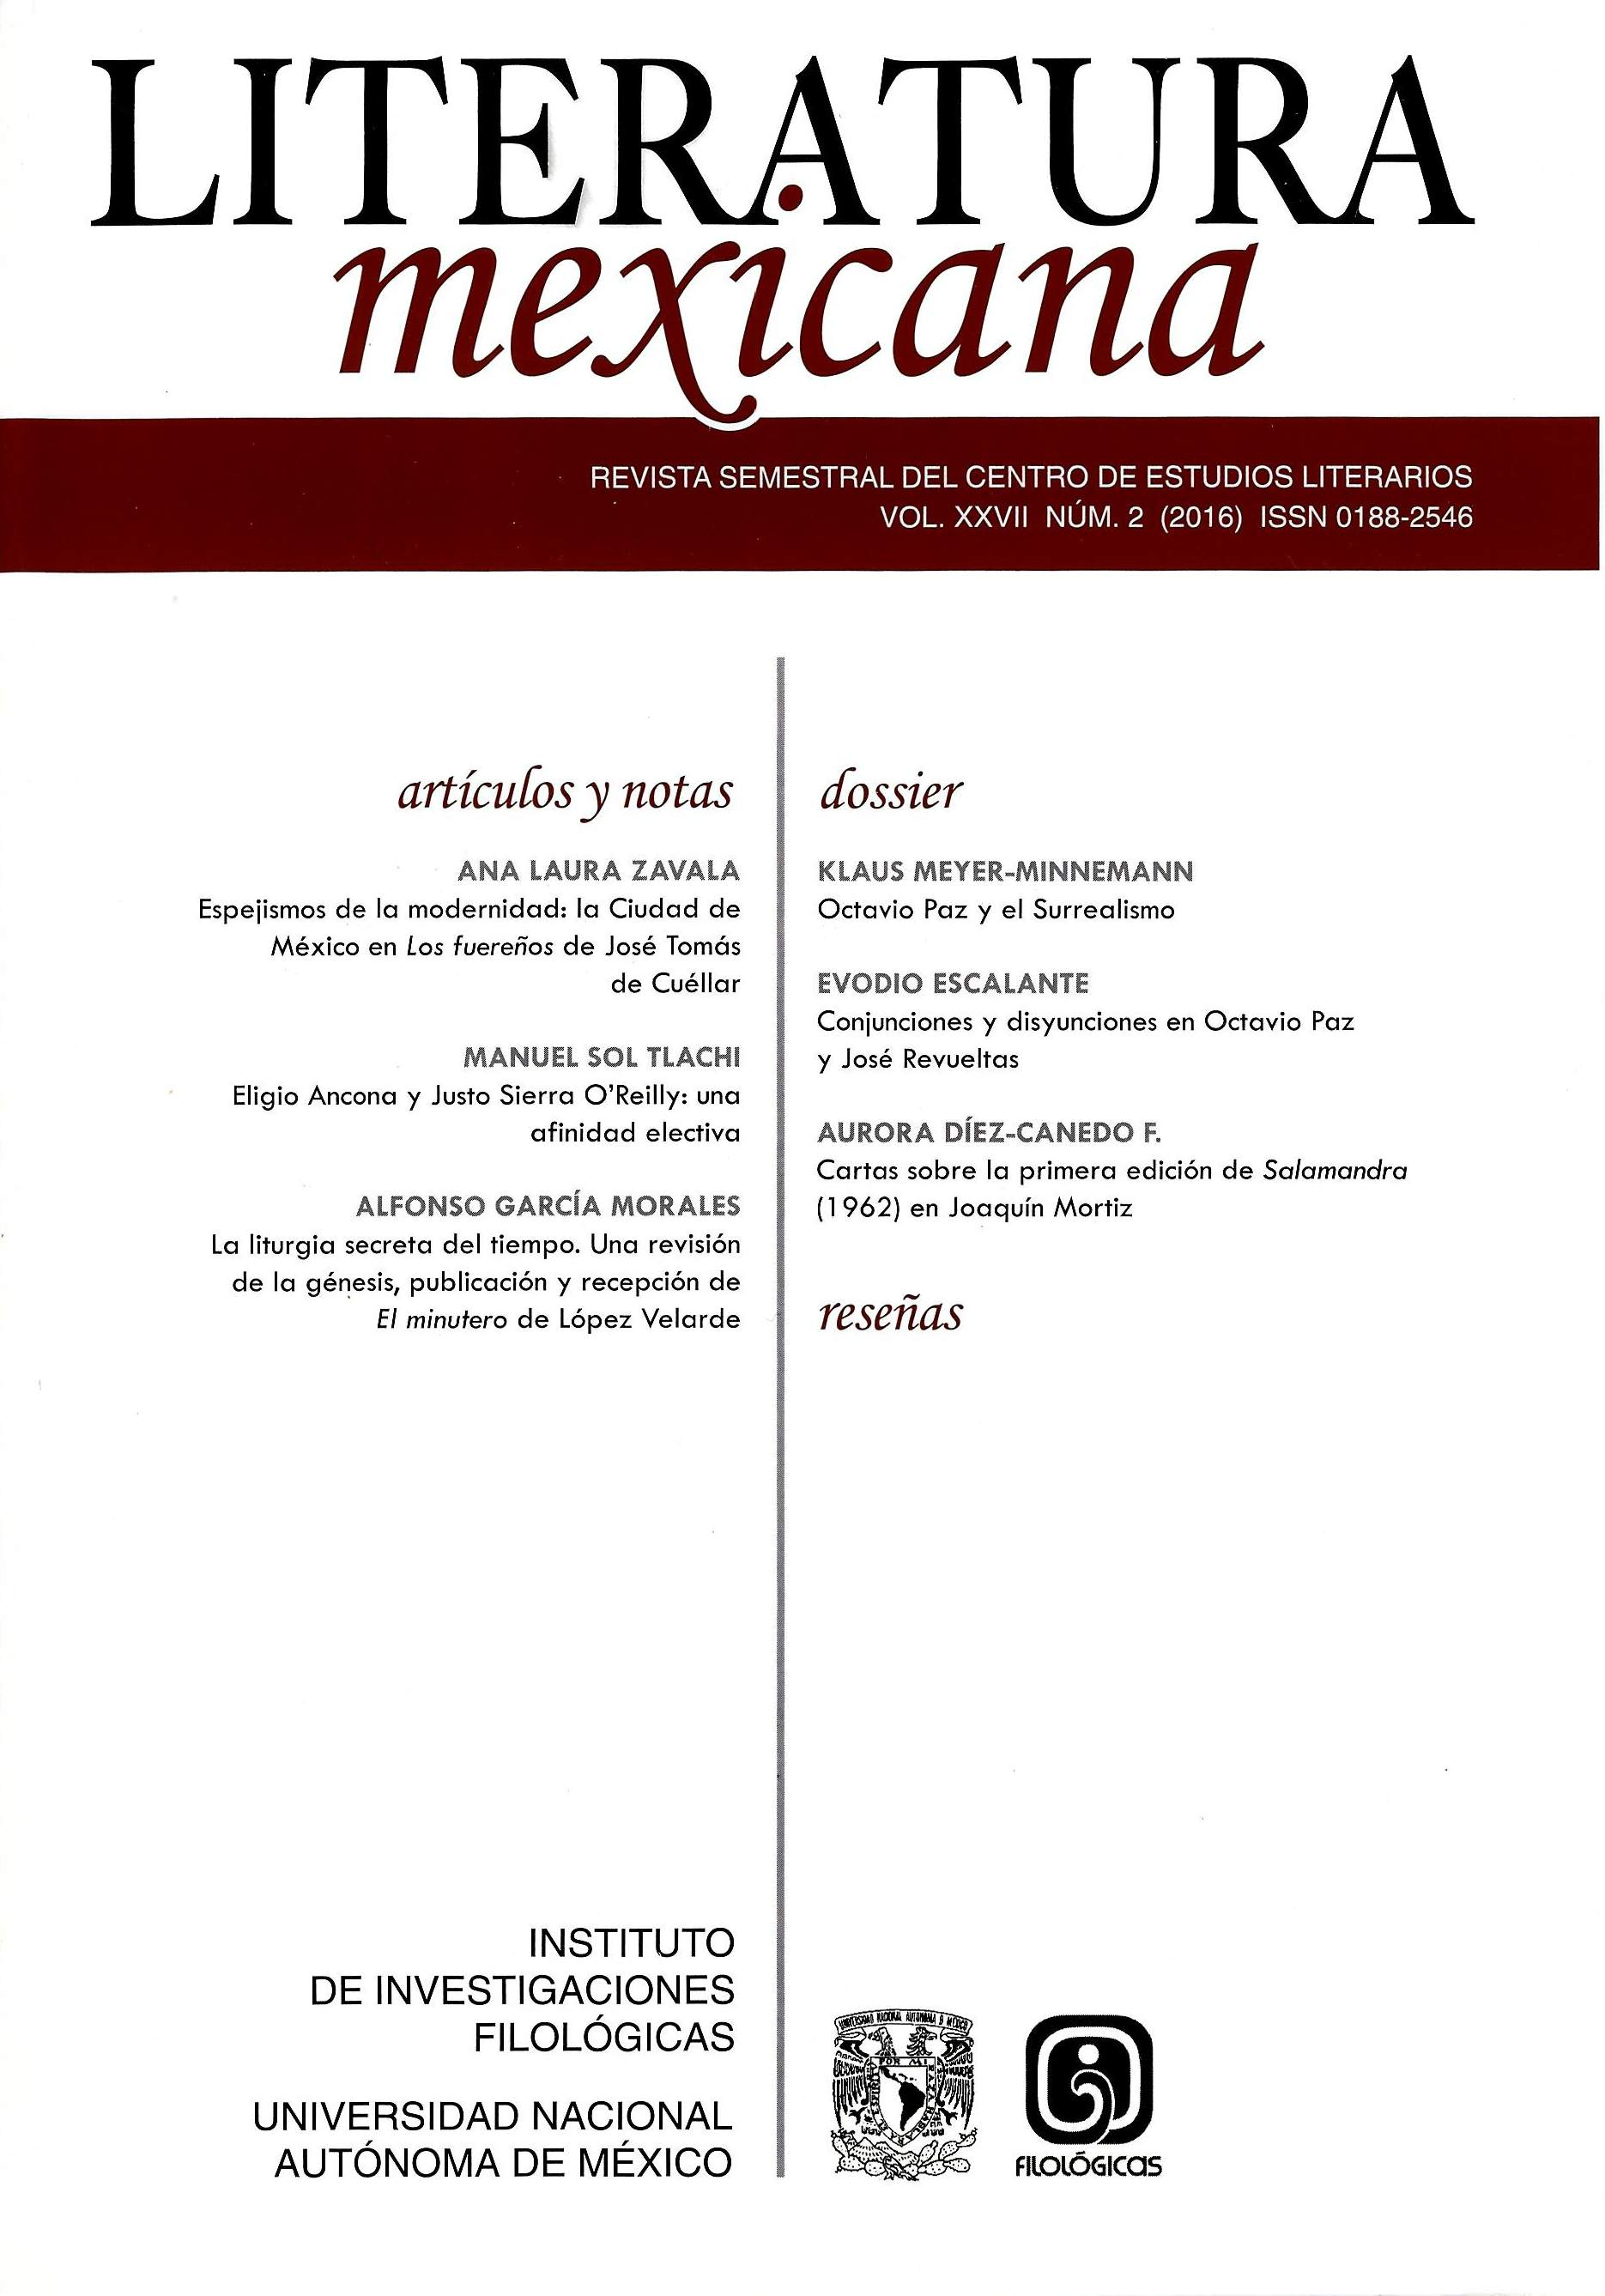 Literatura mexicana, vol. XXVII, núm. 2 (2016)